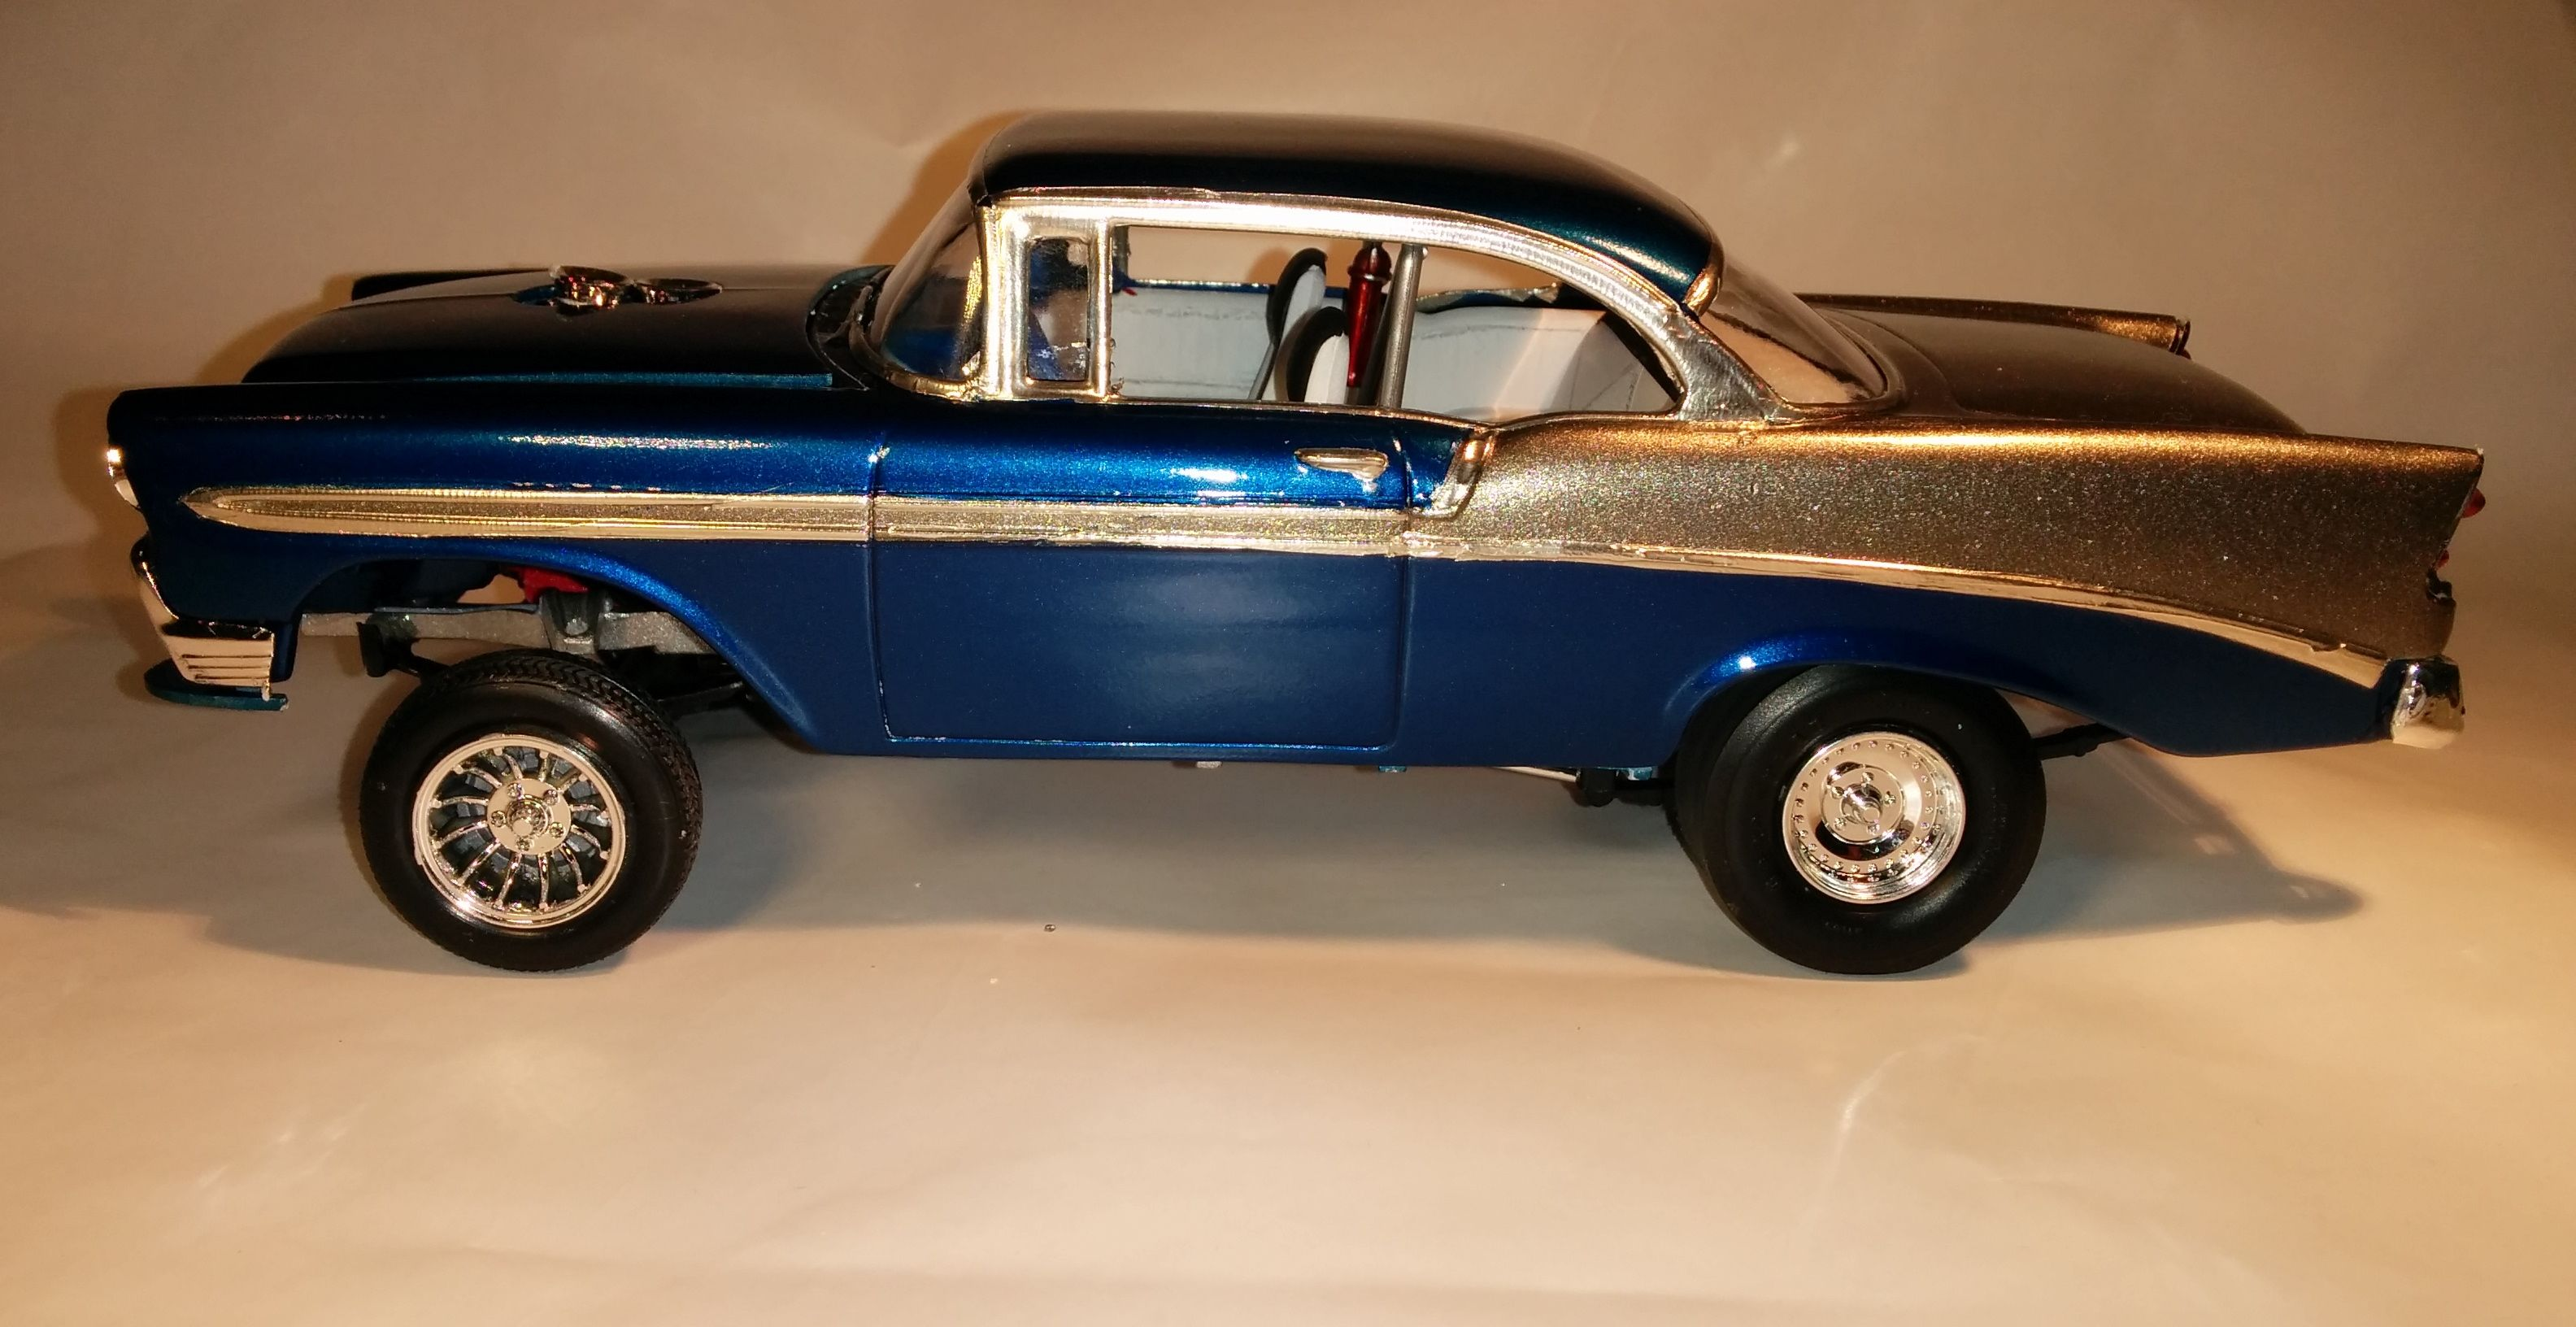 1956 chevy bel air gasser scale model cars cars trucks scale rh pinterest com